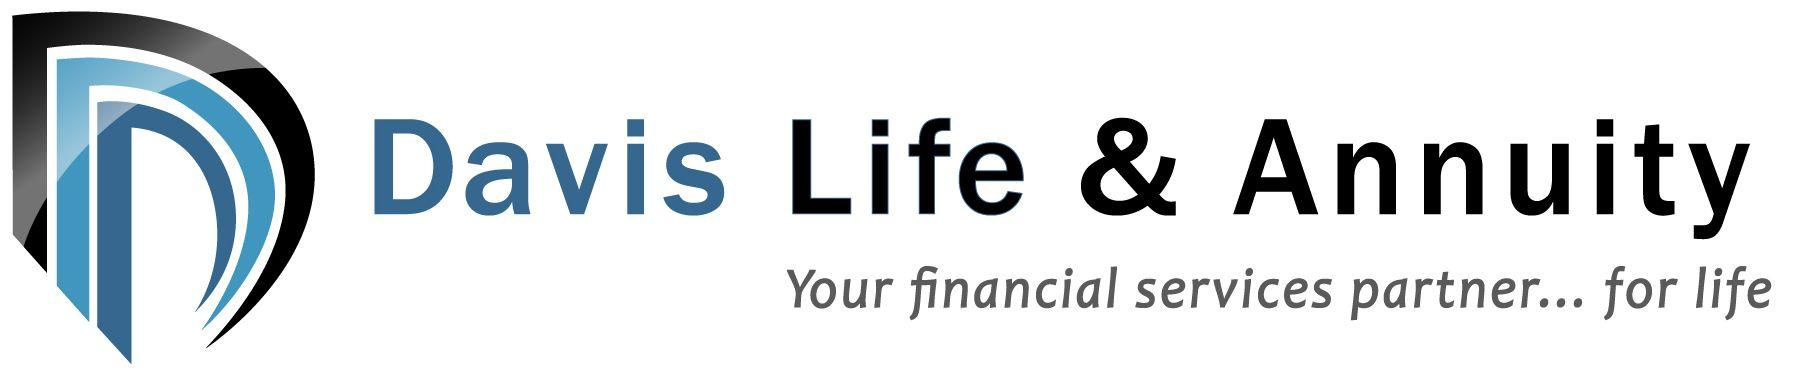 Davis Life Annuity Logo